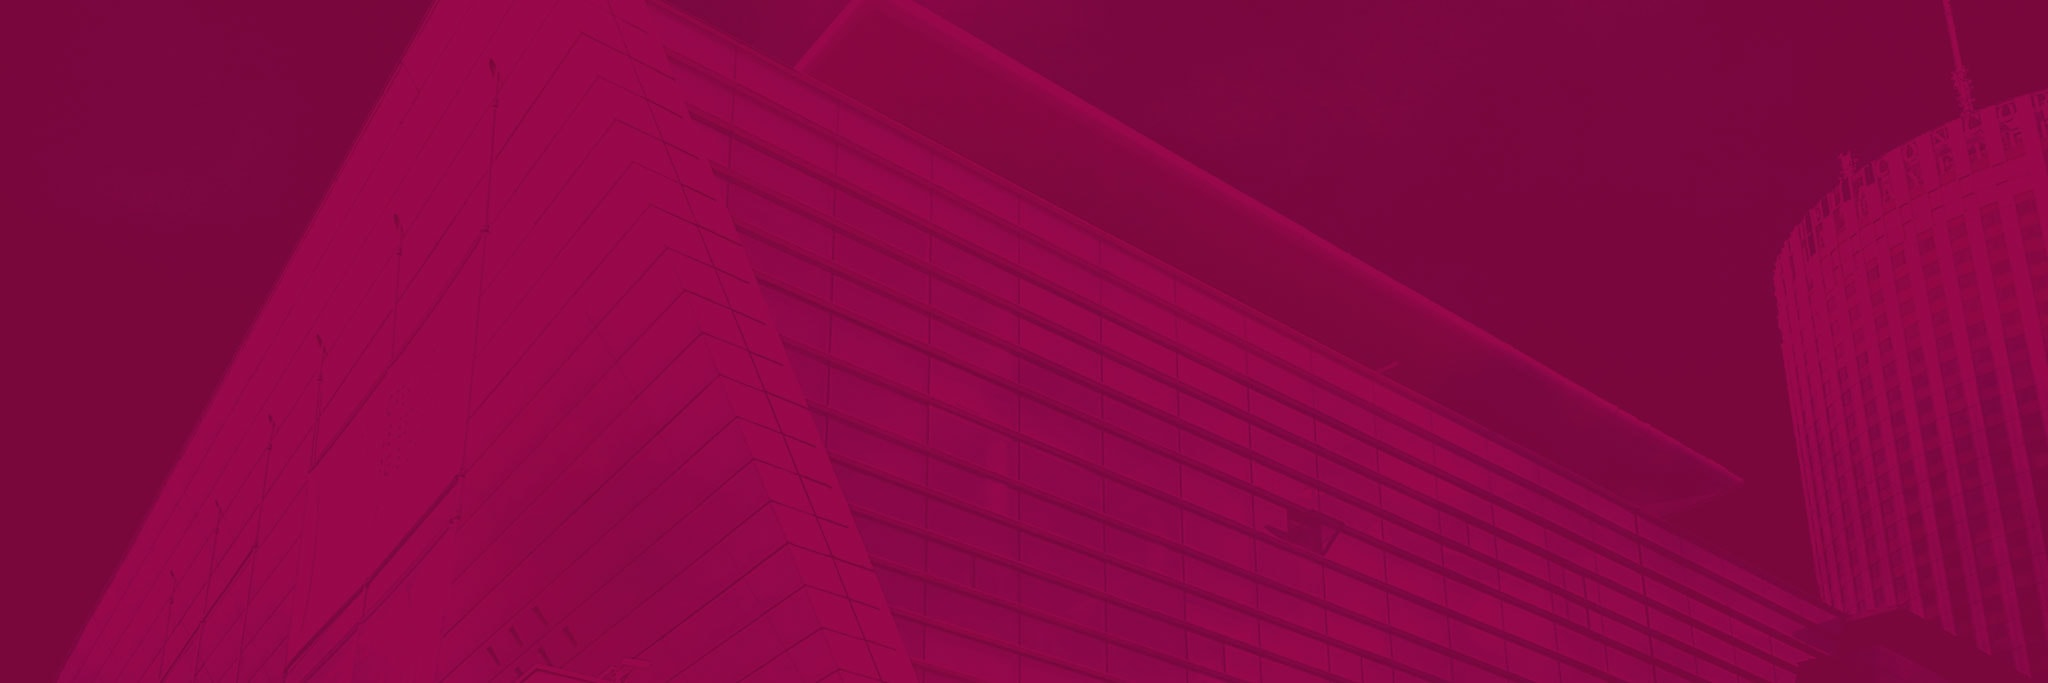 Treize Cent Treize sera présente au SIMI 2018